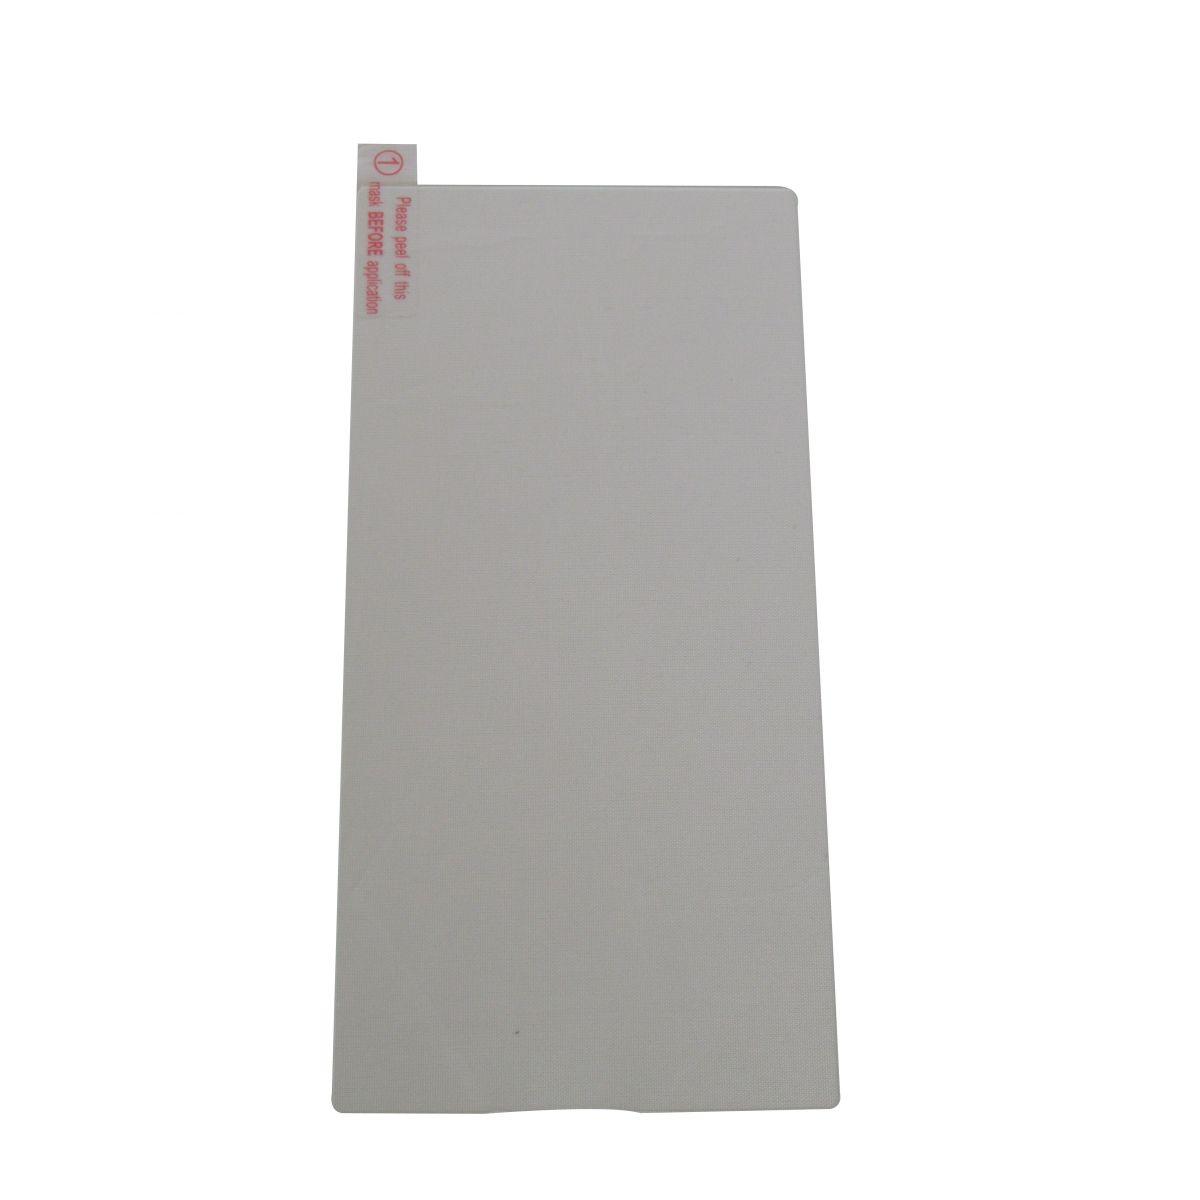 Película de Vidro para Sony Xperia Z1 C6903 C6902 L39h